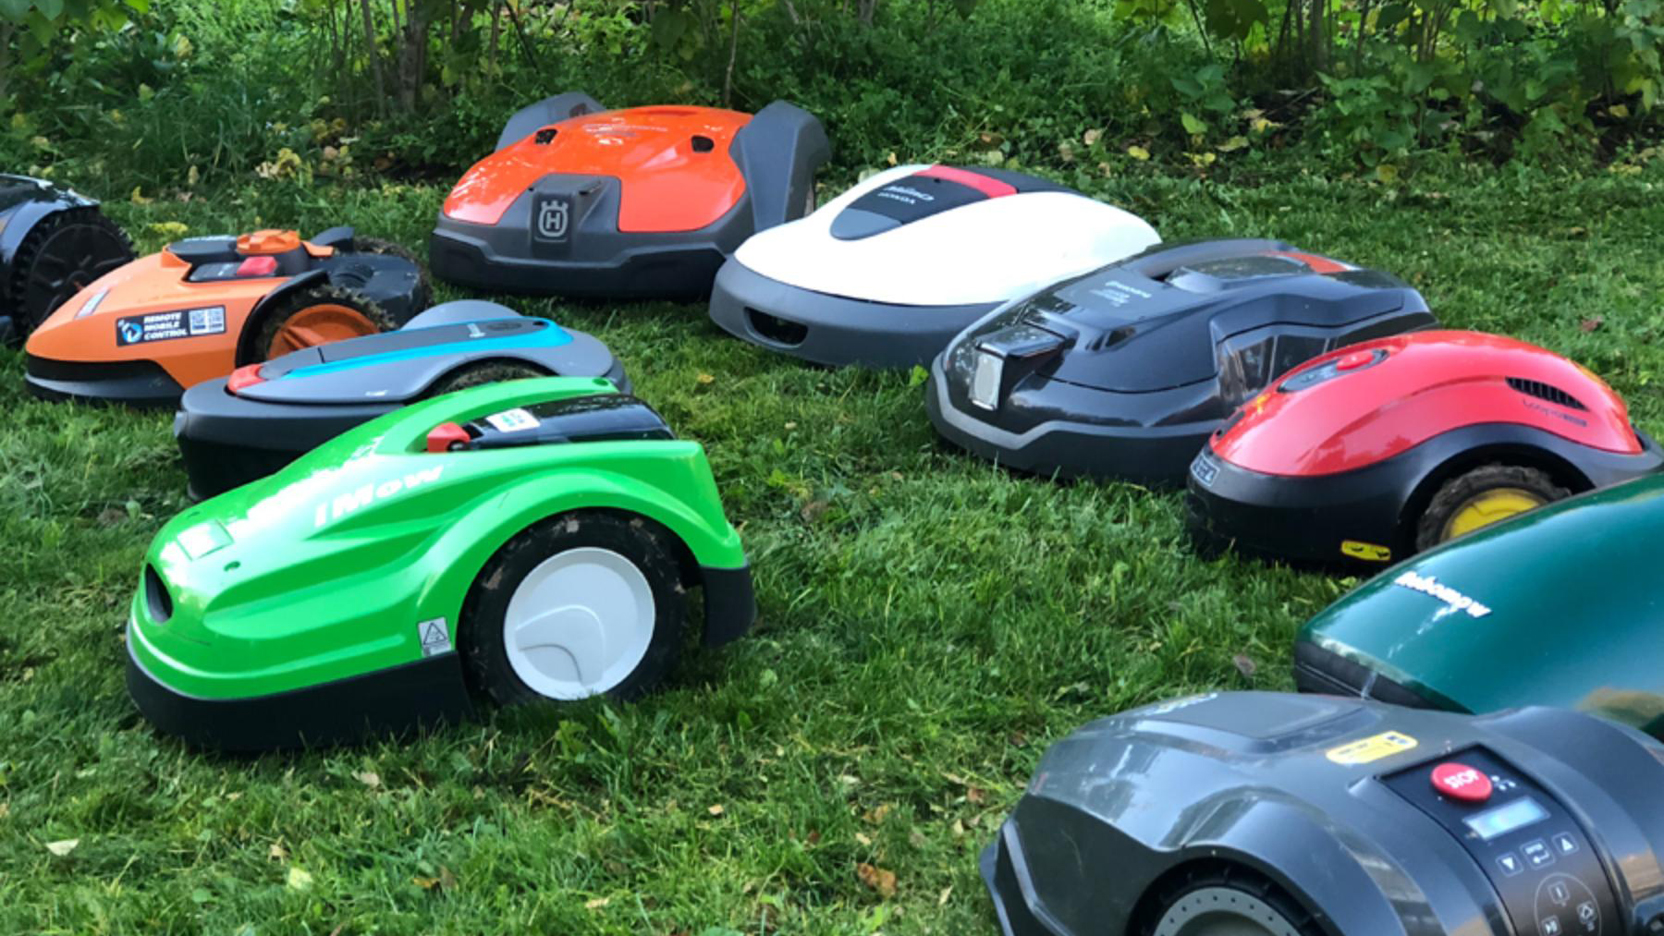 Top 27 Best Robotic Lawn Mowers Of 2020